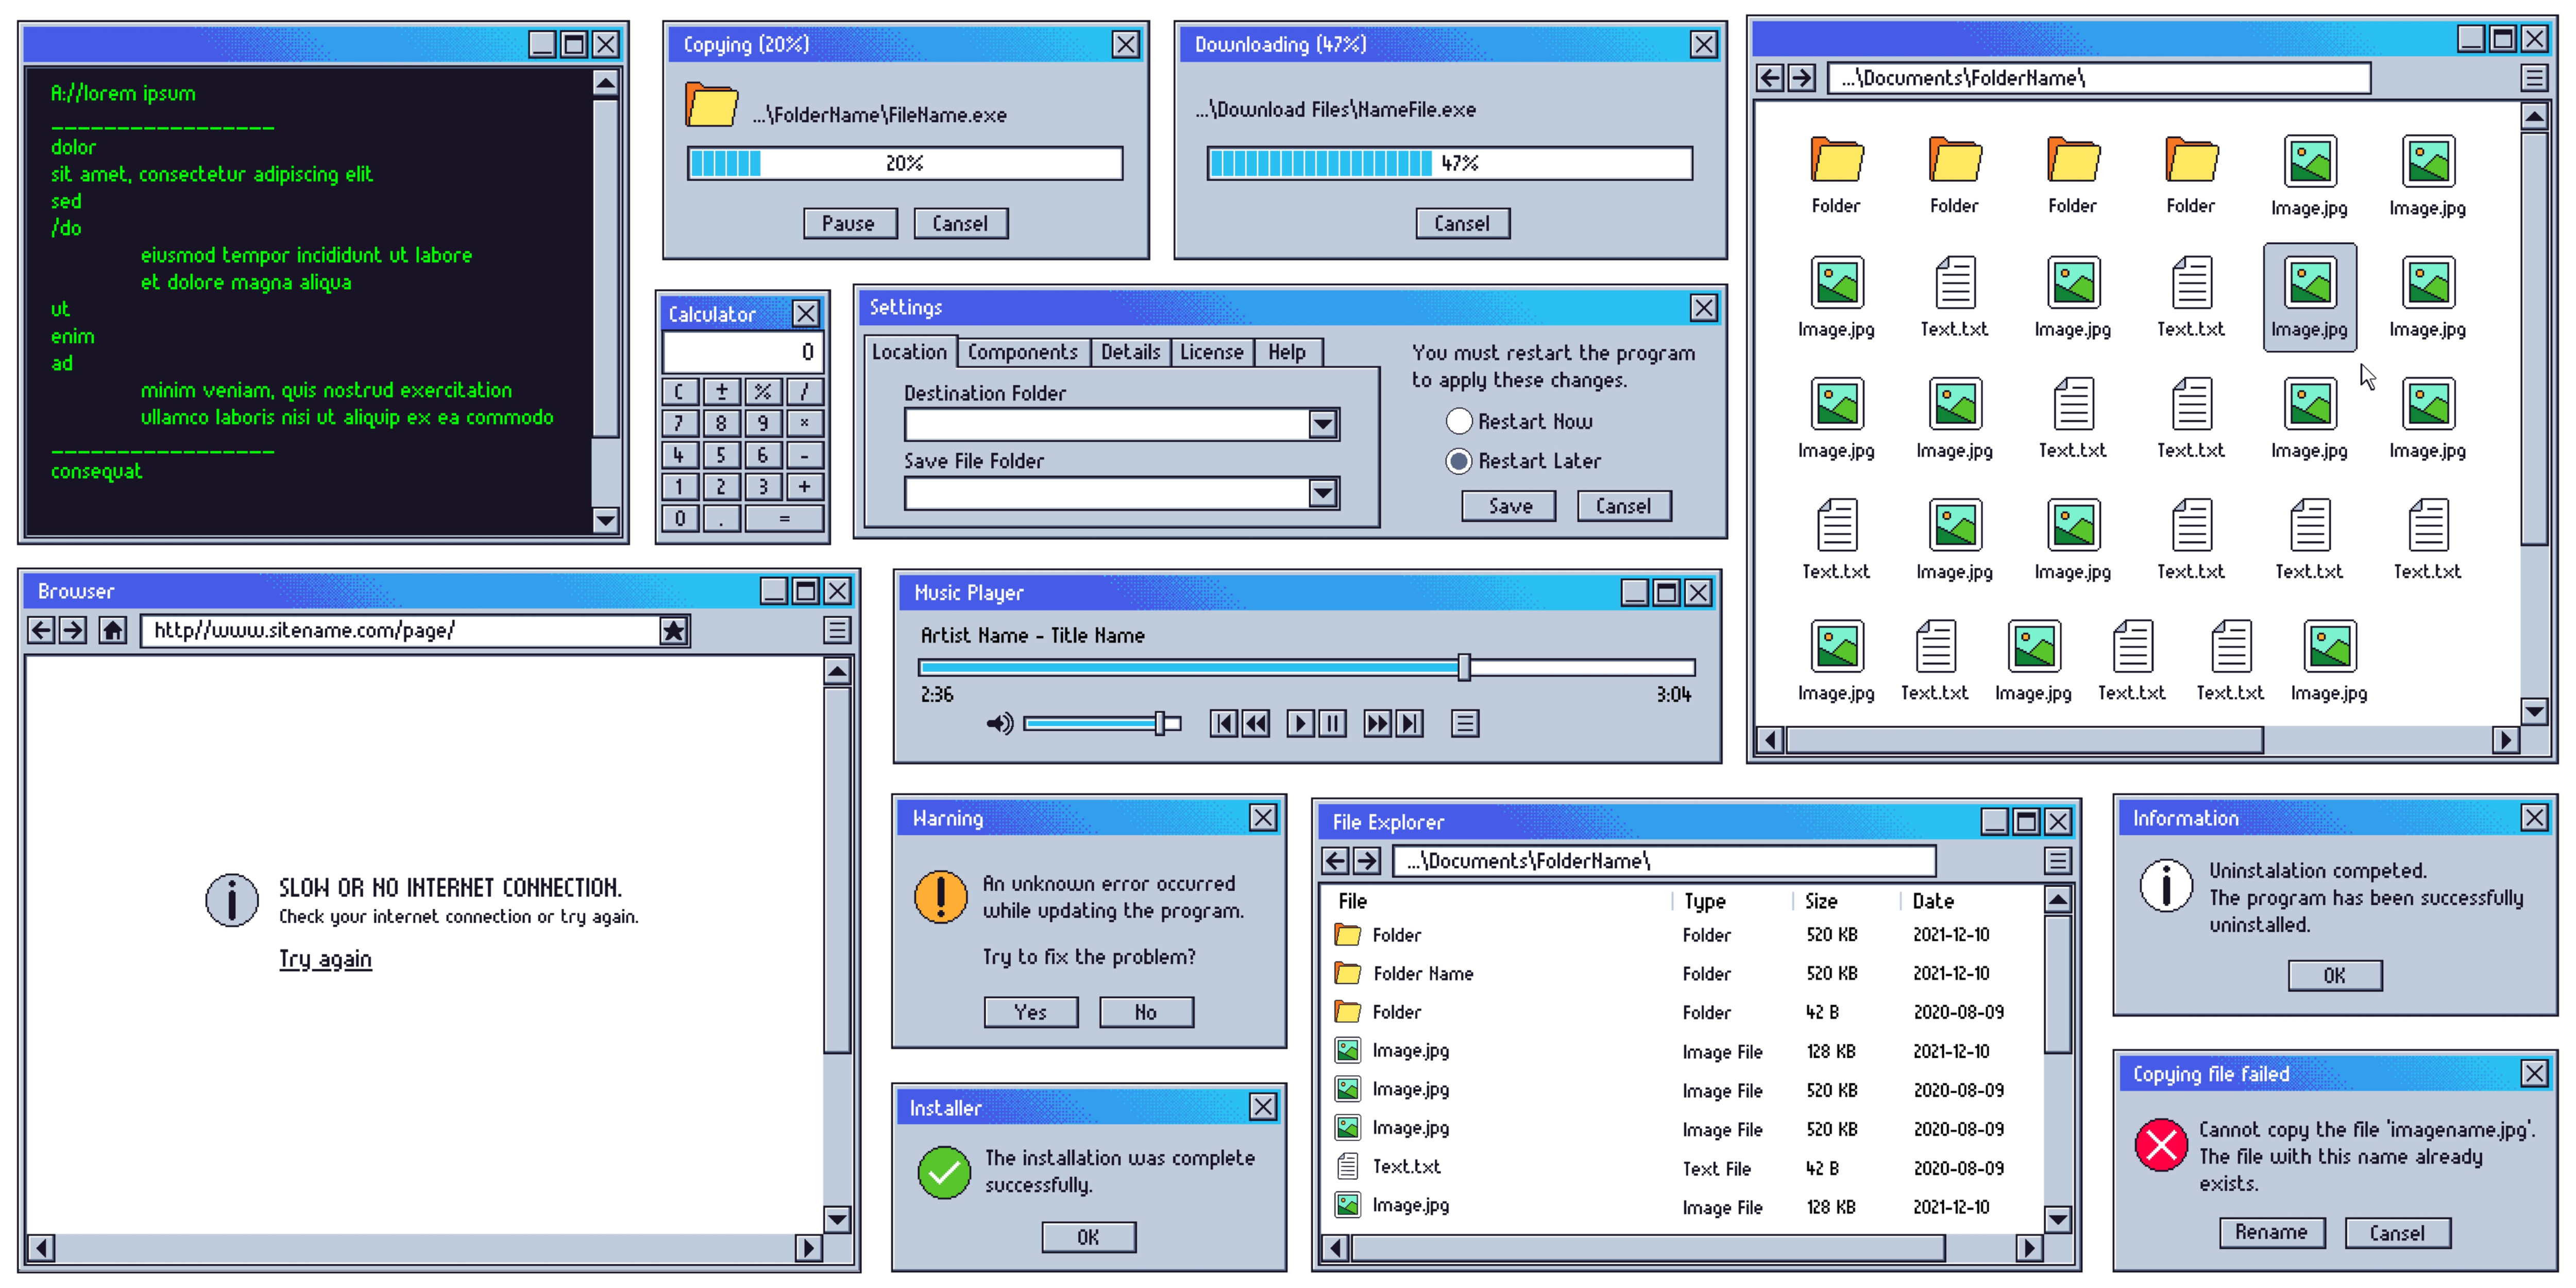 Software localization process